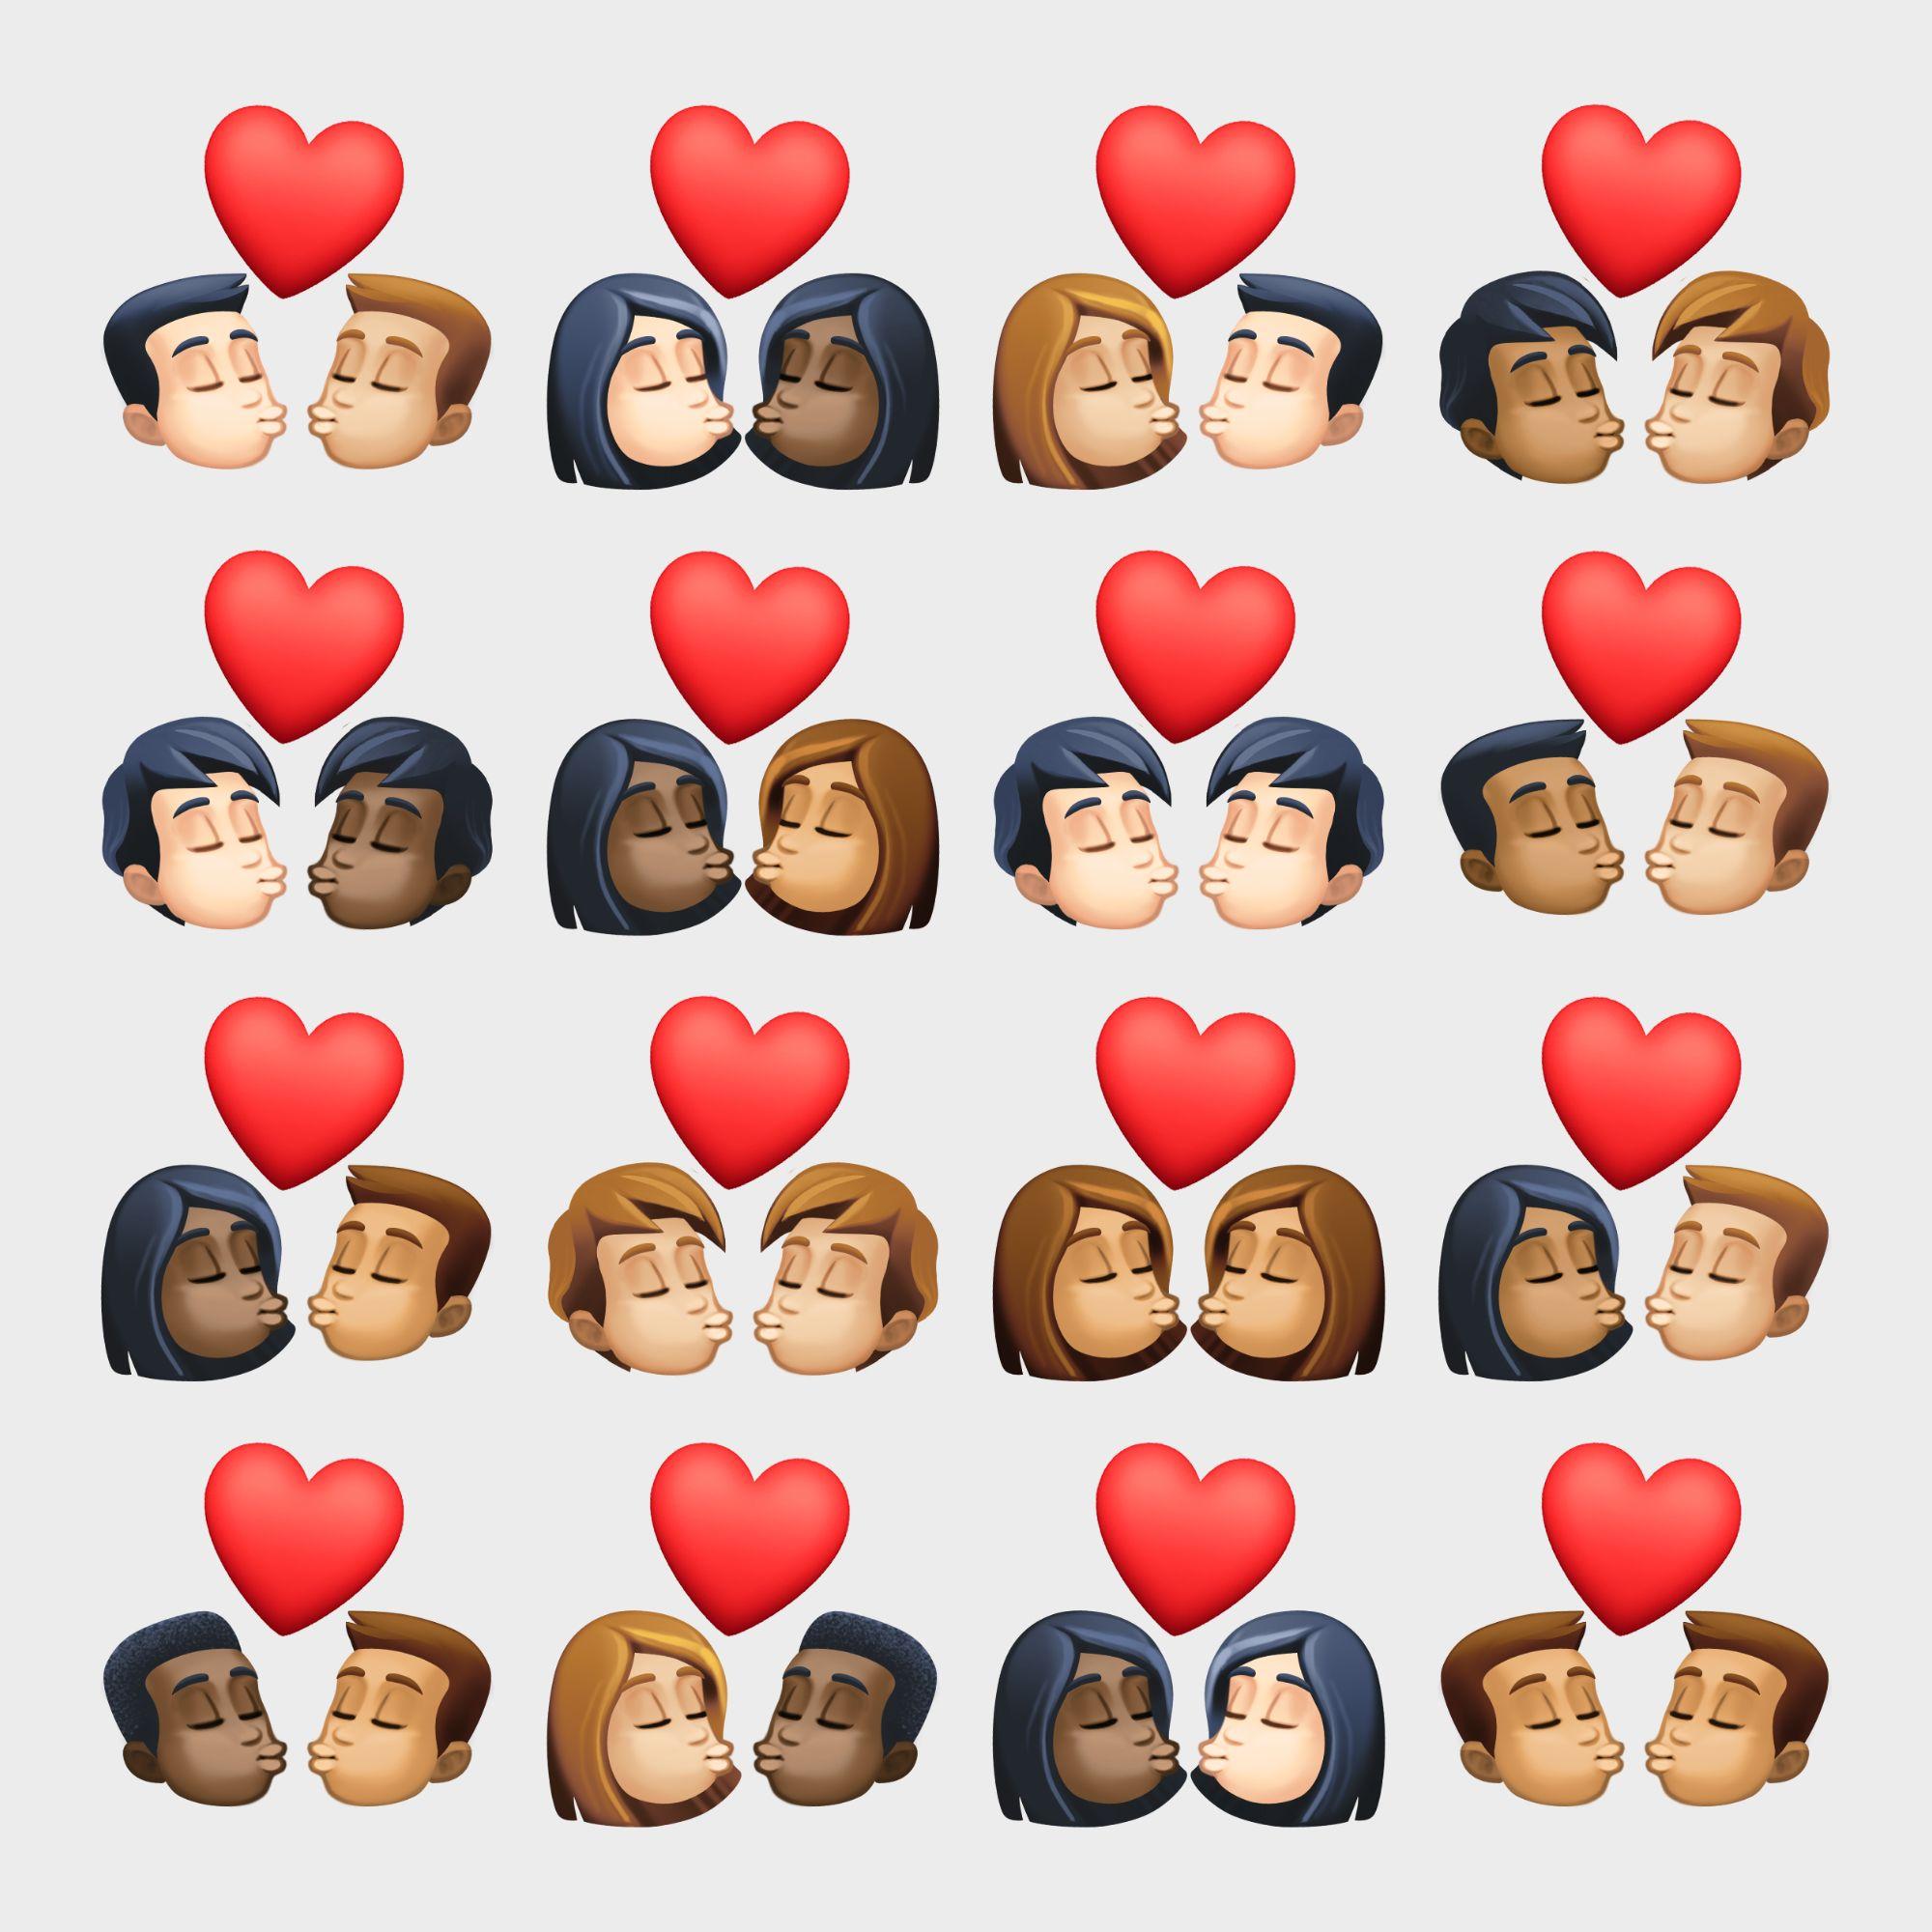 Emojipedia-Facebook-13_1-Emoji-Changelog-New-Kiss-Selection